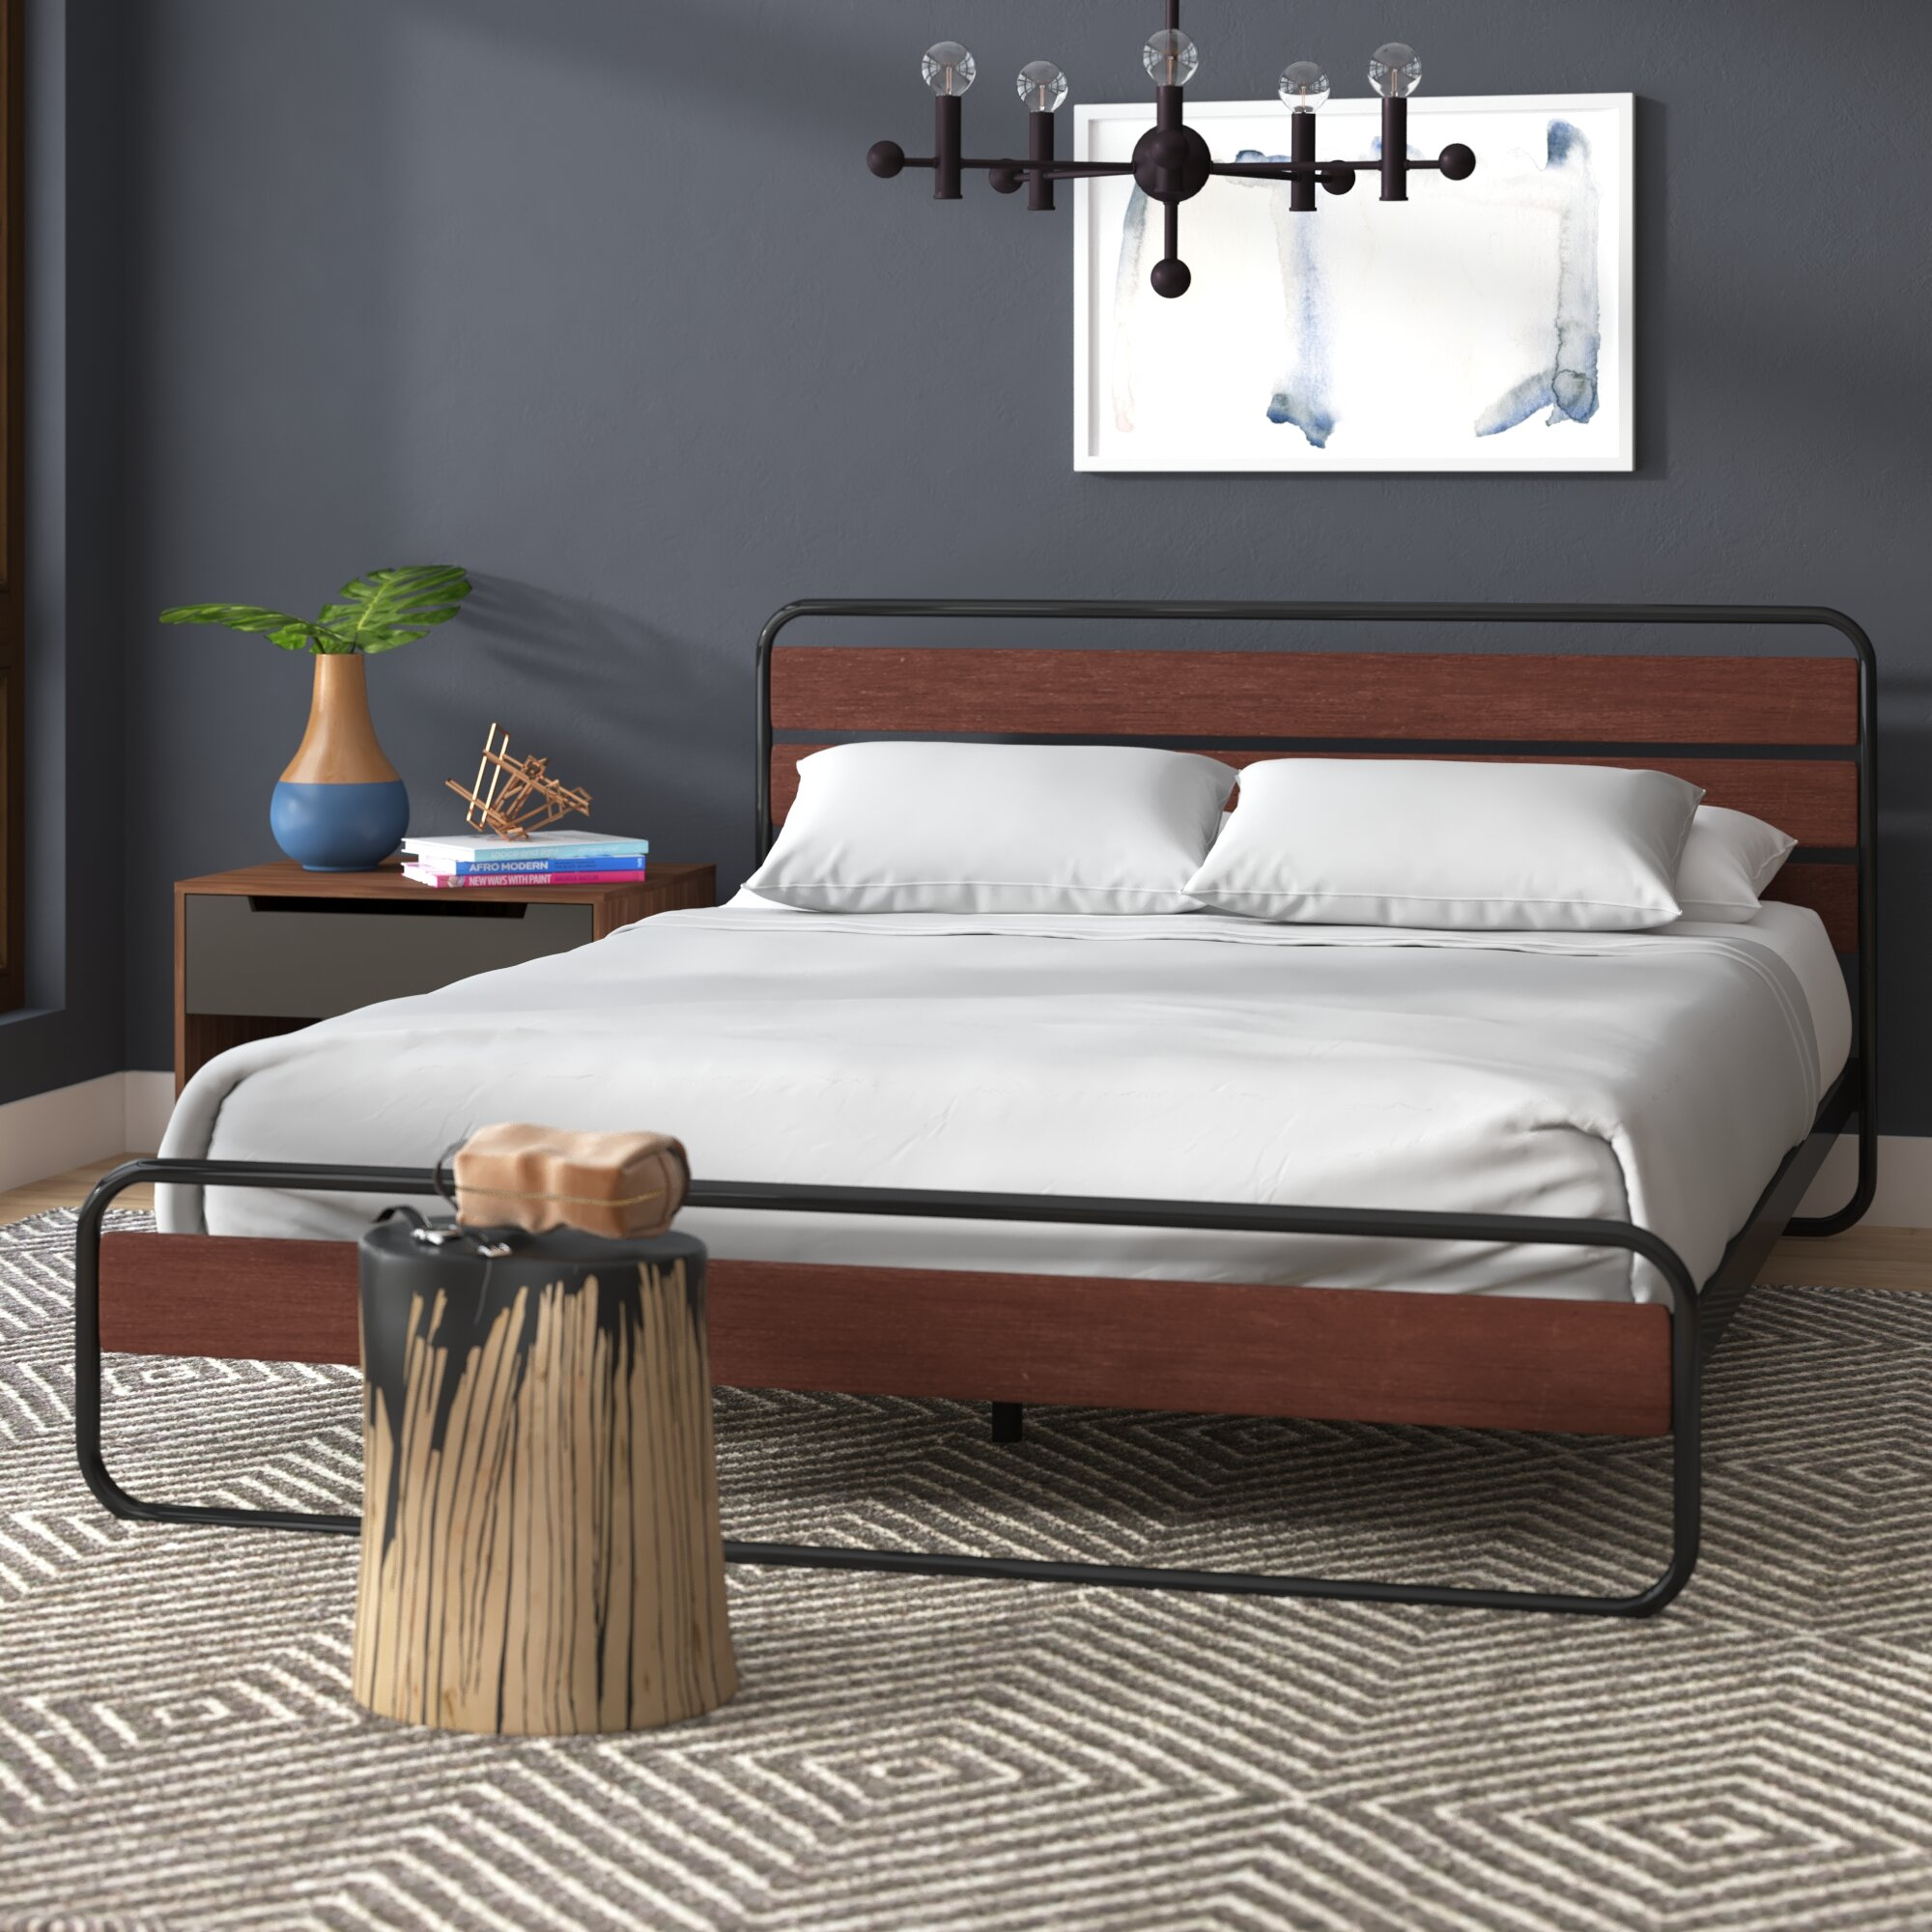 Industrial Metal Beds You Ll Love In 2021 Wayfair